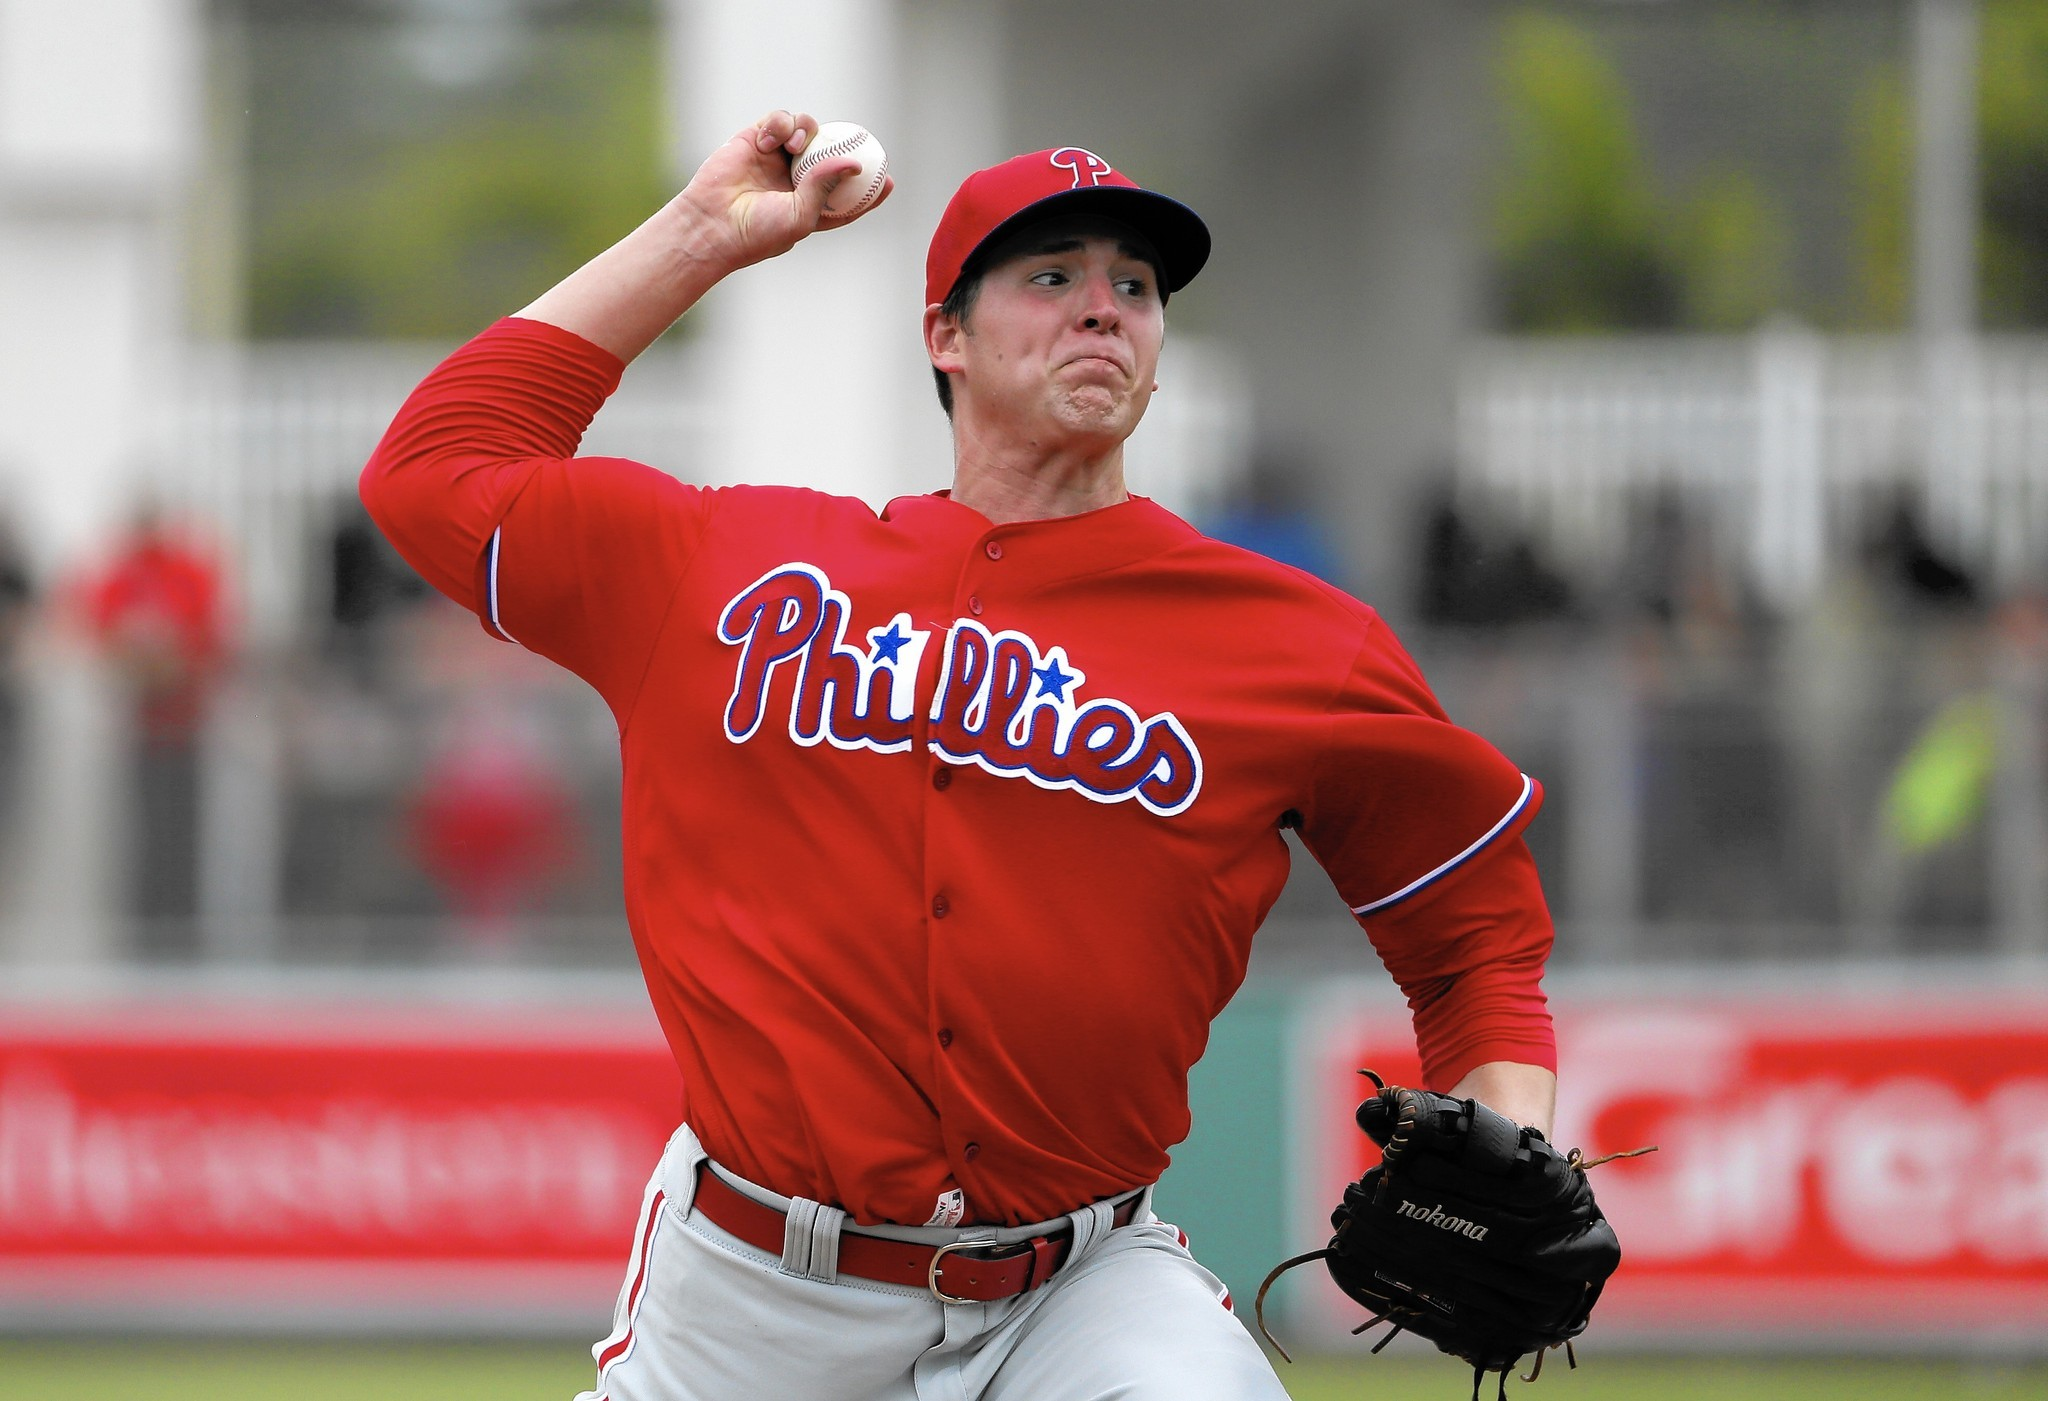 Mc-phillies-starting-rotation-pitching-2016-20160331